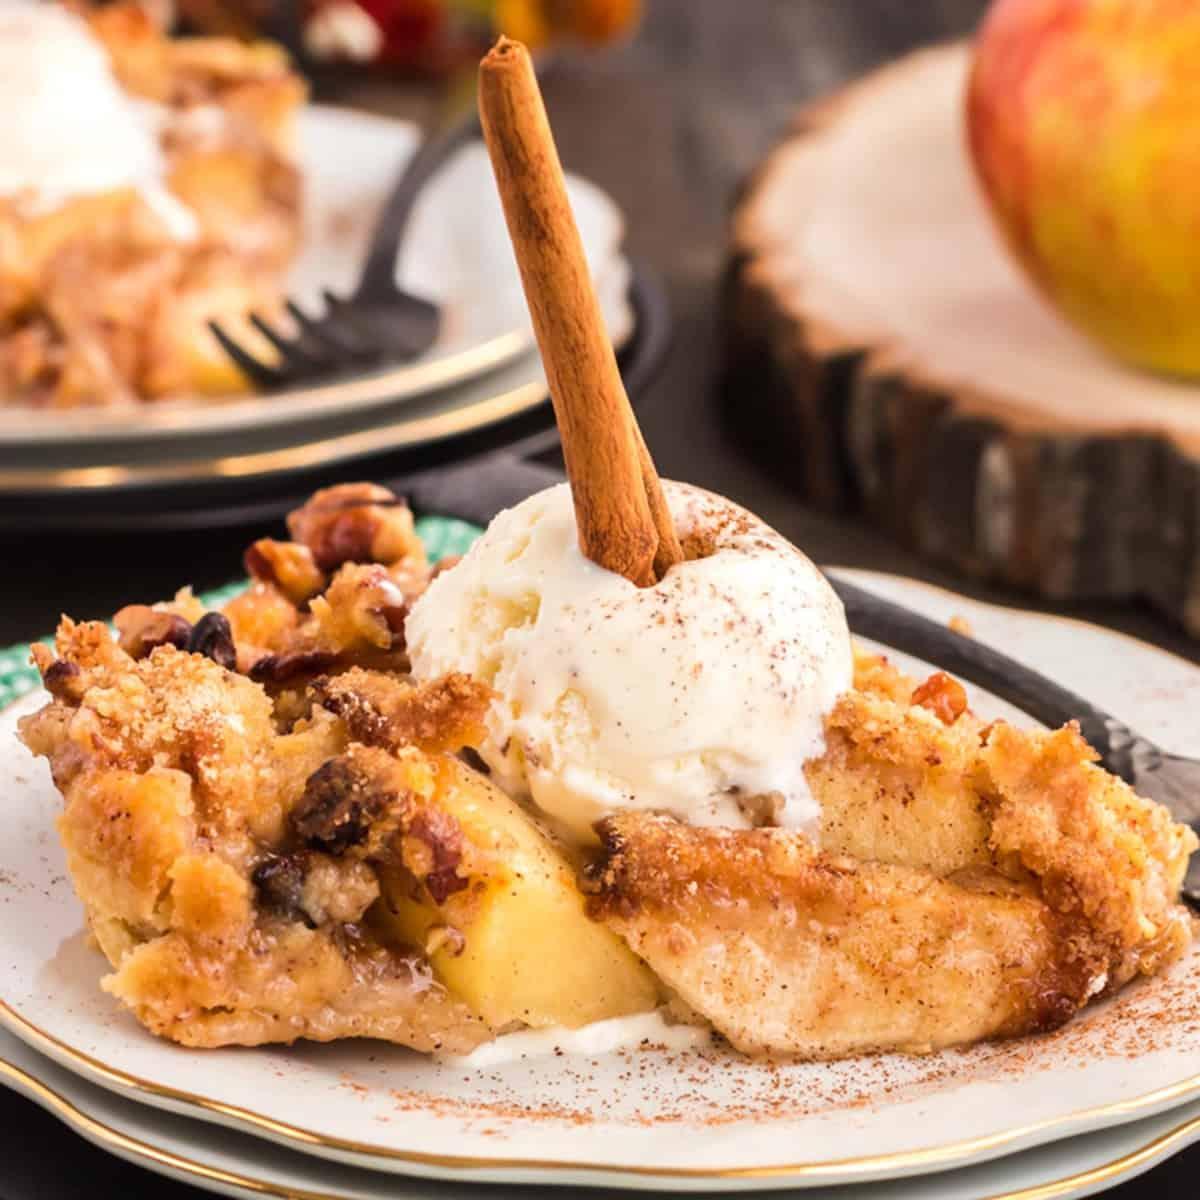 Dutch apple pie on a plate with ice cream and a cinnaomn stick.